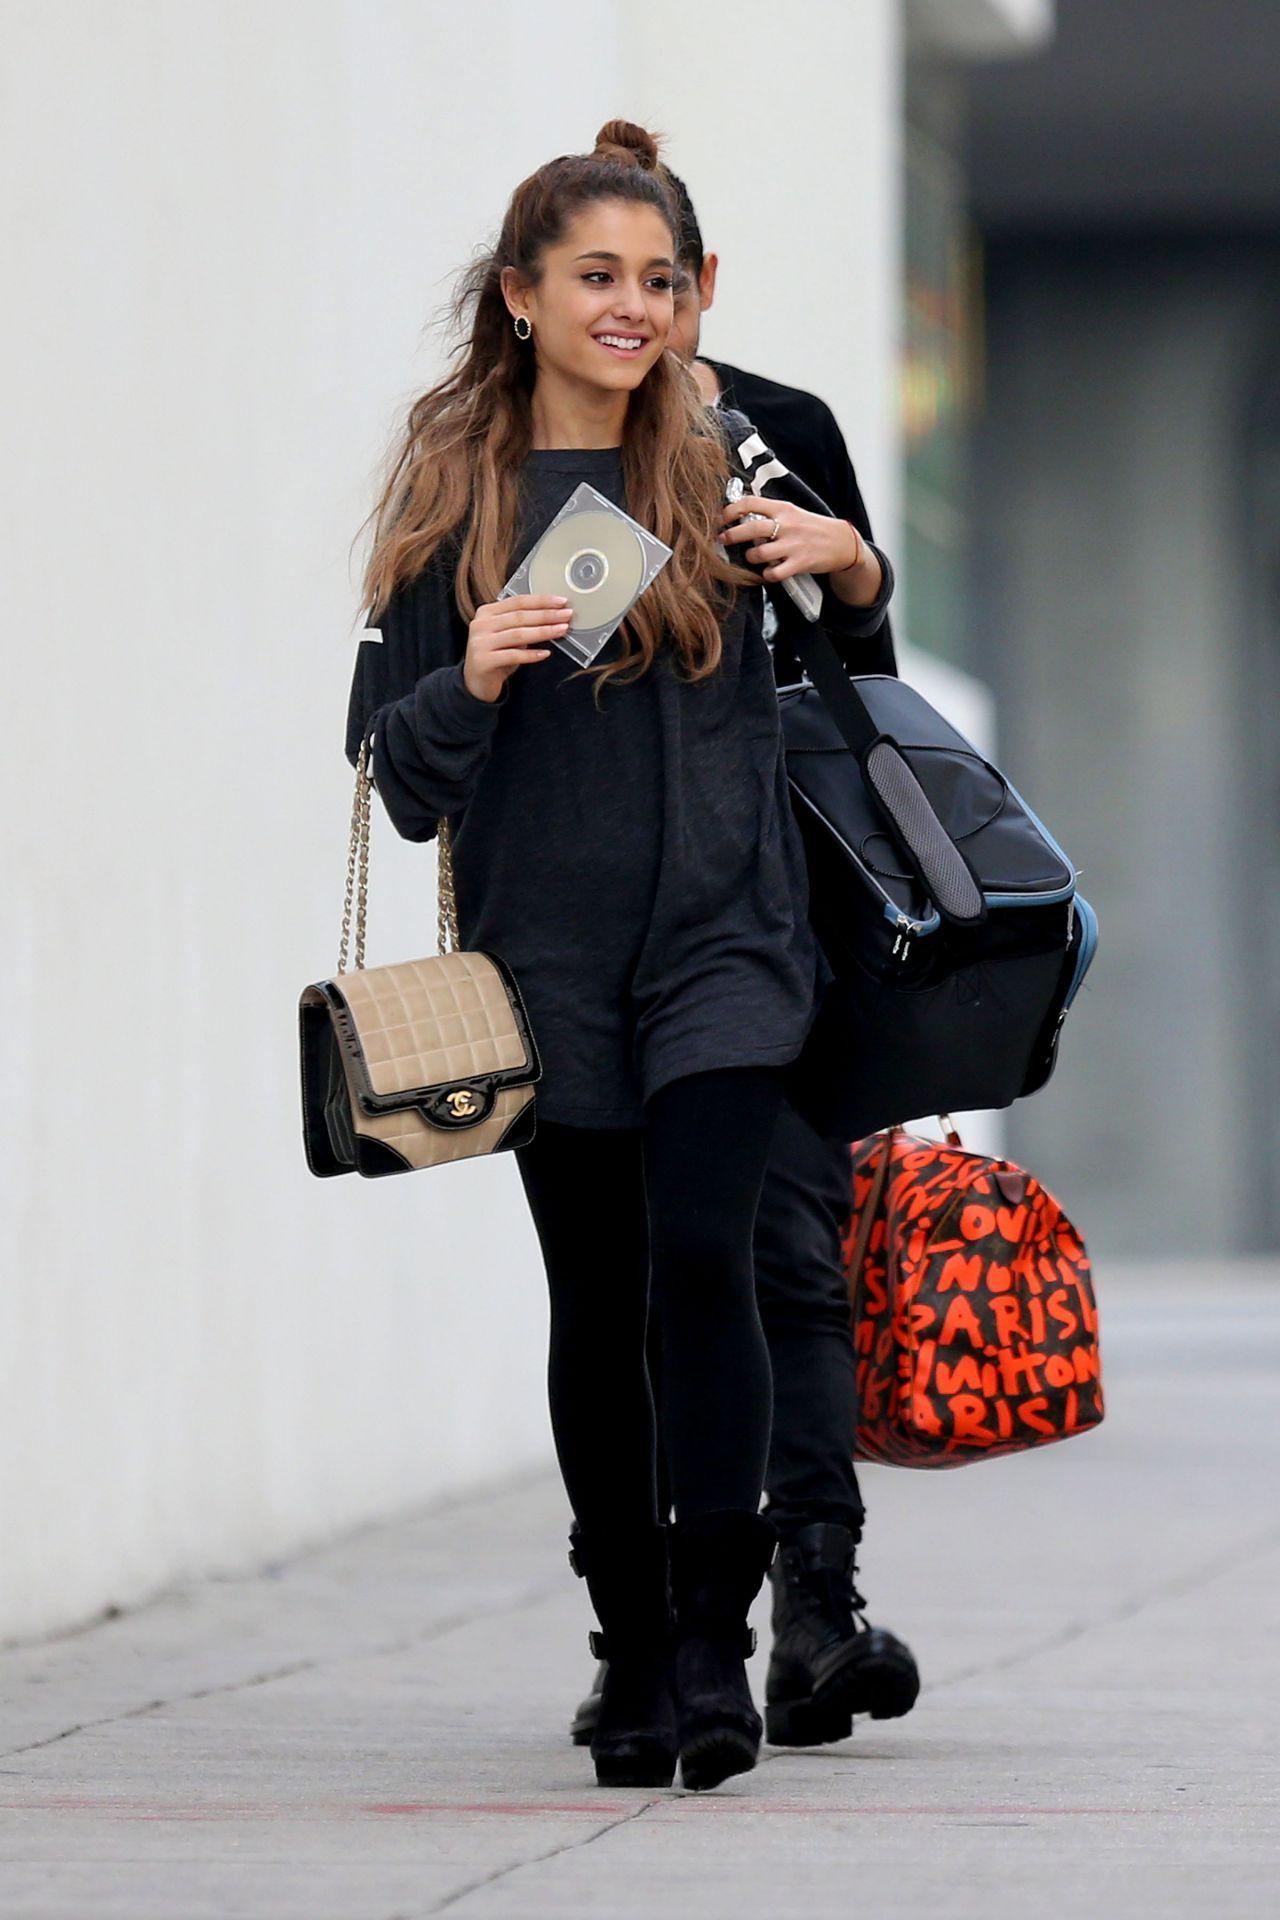 Ariana Grande Black Dress 2014